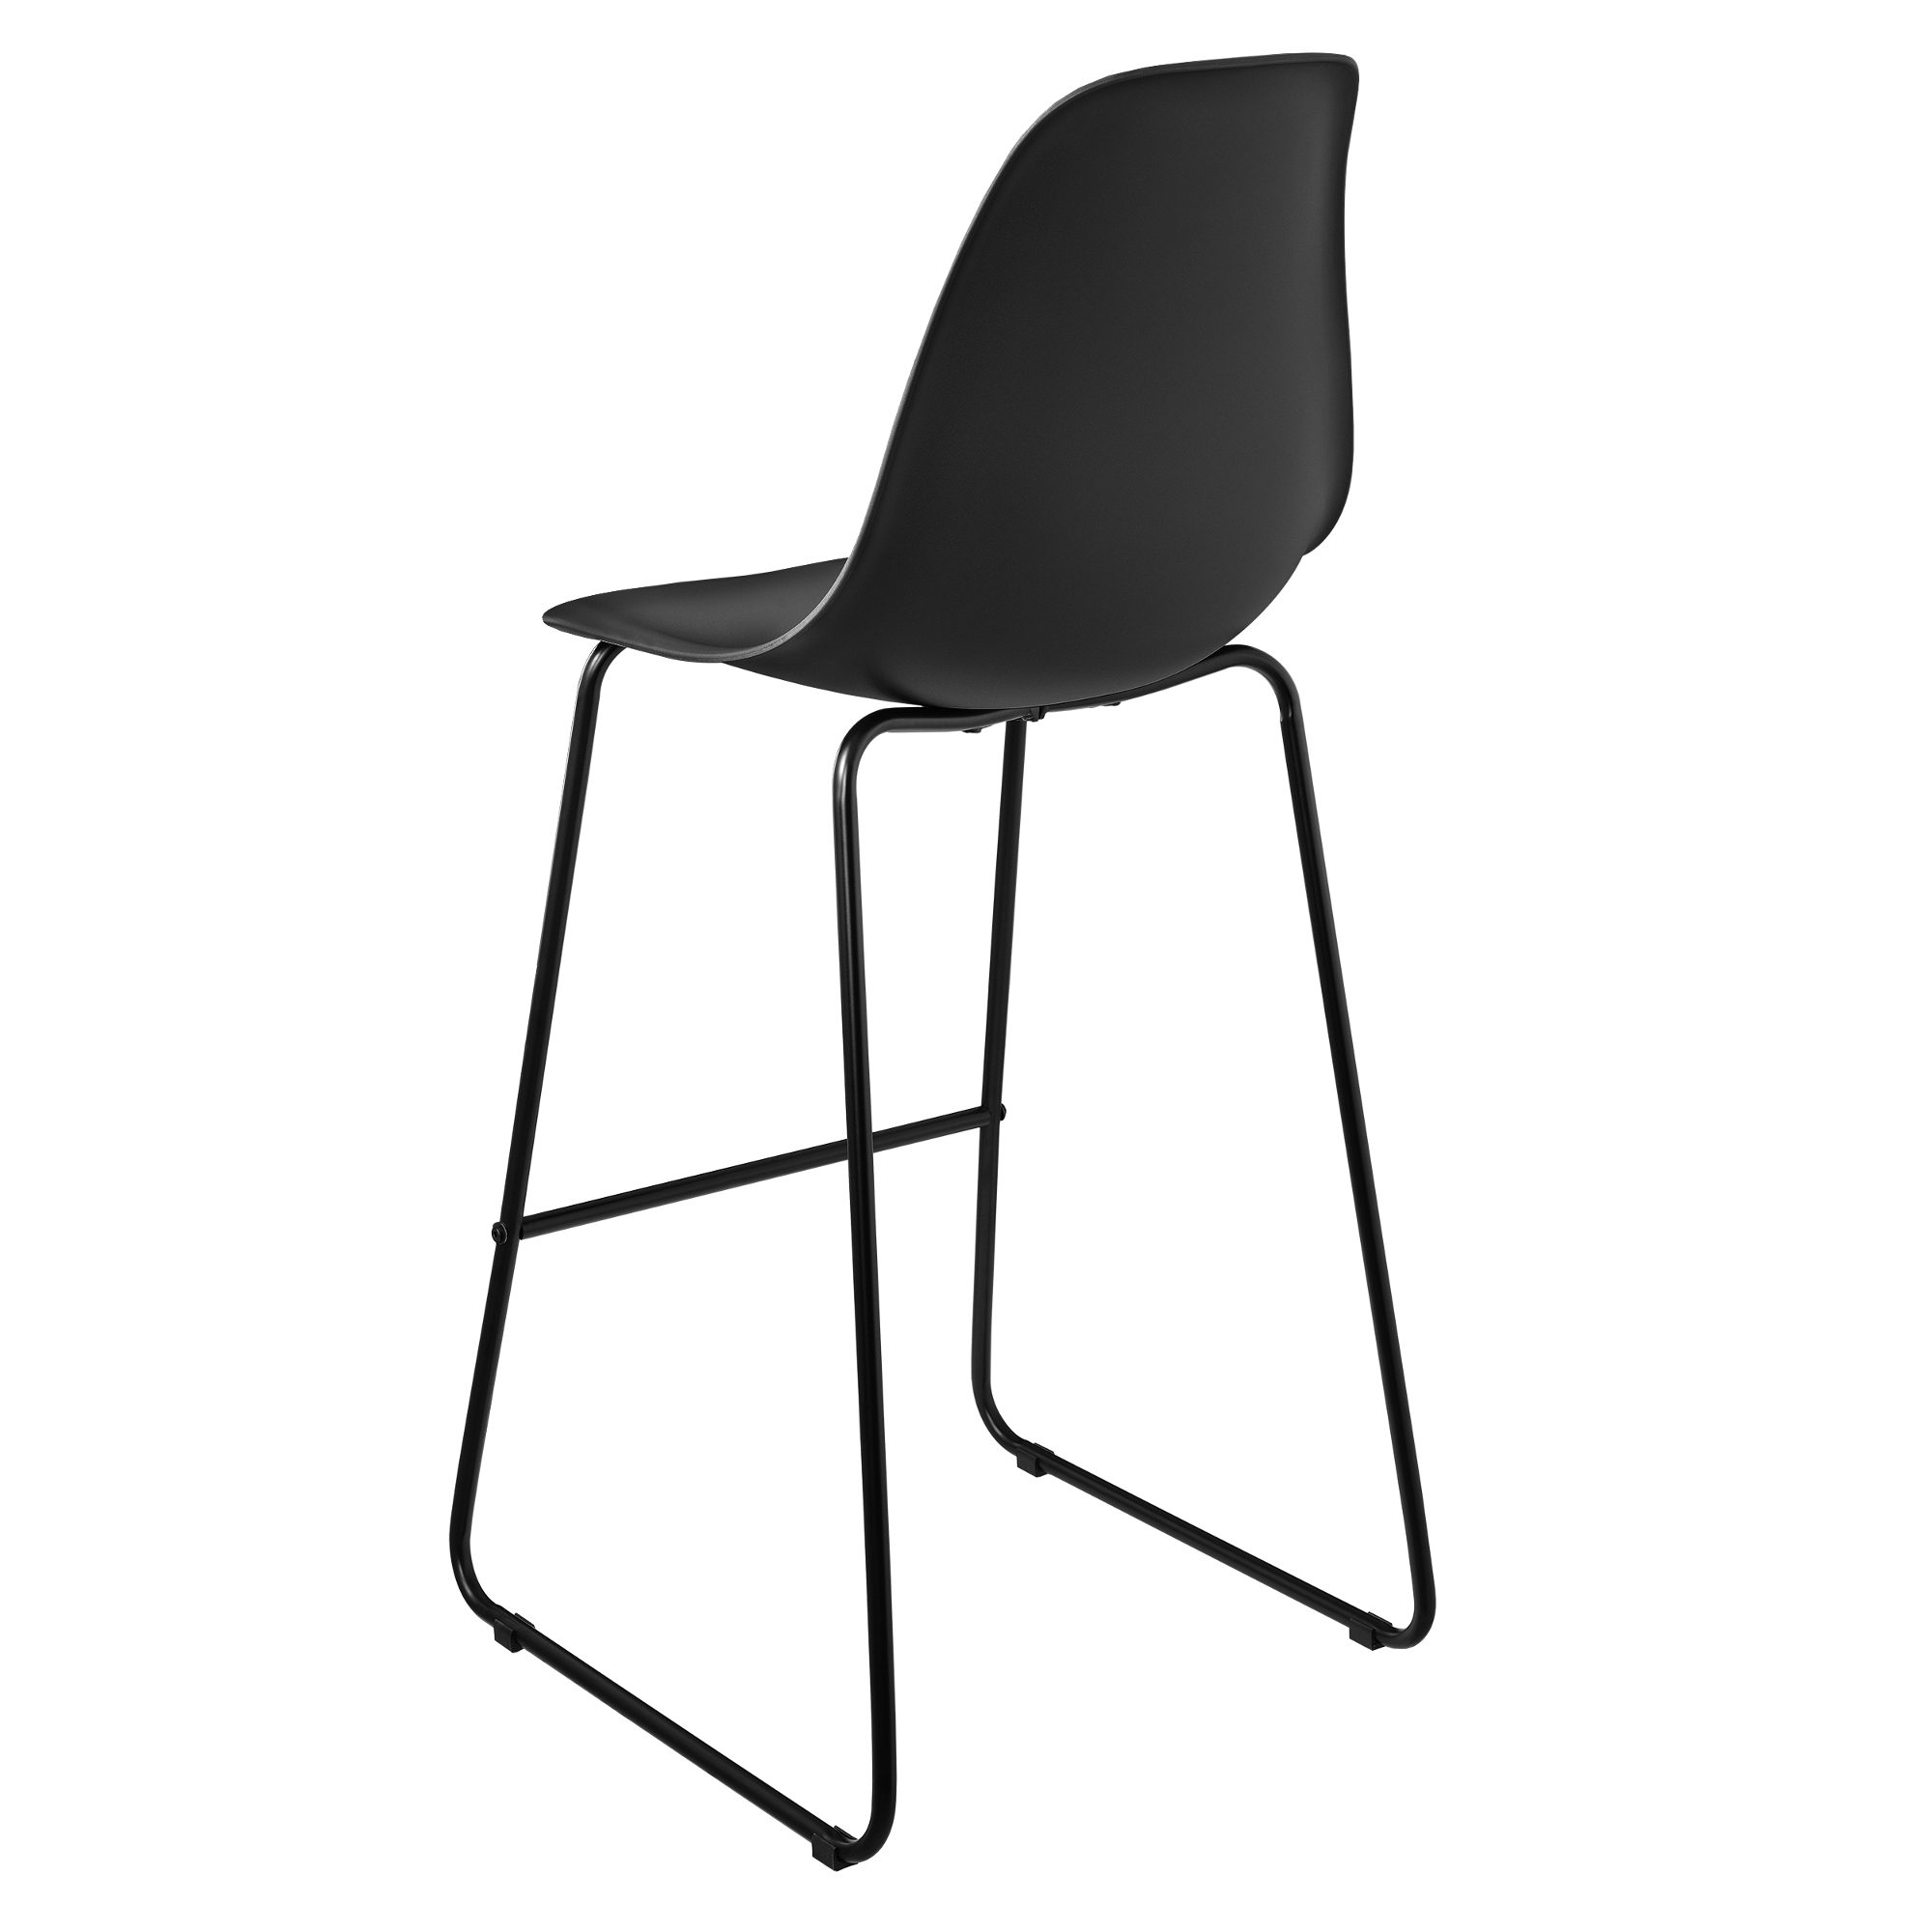 2x barhocker 110x46 5cm schwarz design barstuhl for Barhocker designklassiker